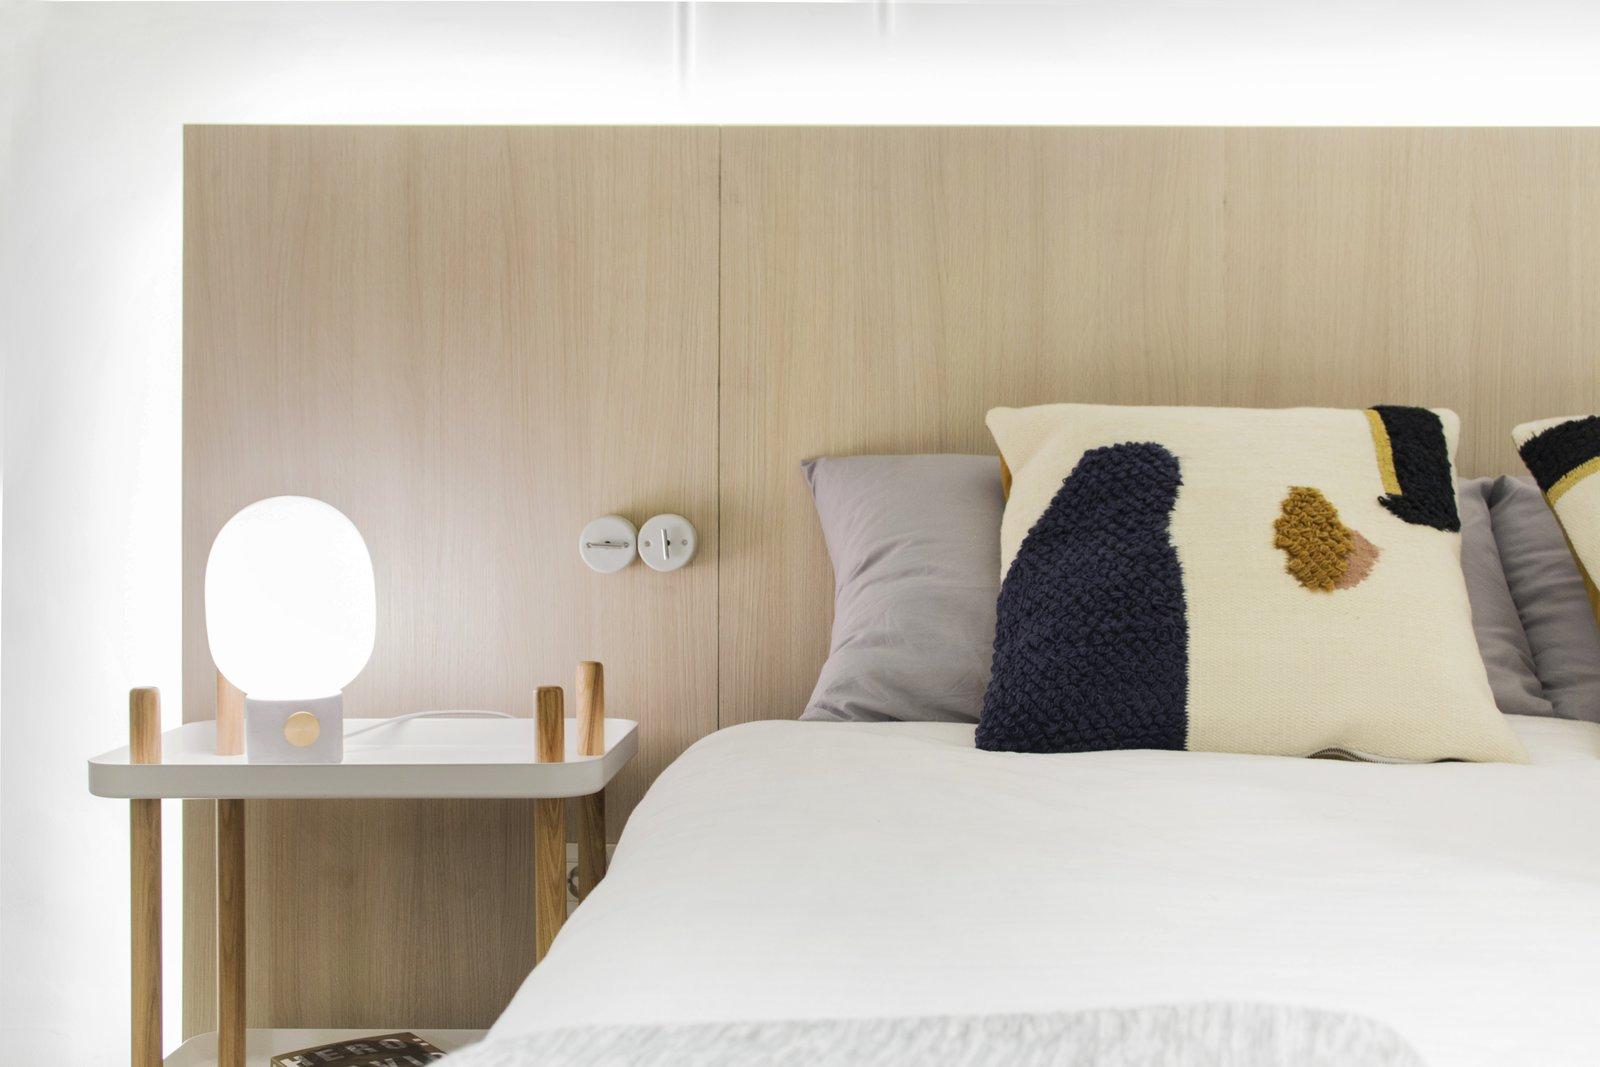 Bedroom, Lamps, Bed, Rockers, Table Lighting, and Night Stands 014.CASA PEX  014.PEX 114 - Apartment Renovation by estudio AMÁSL